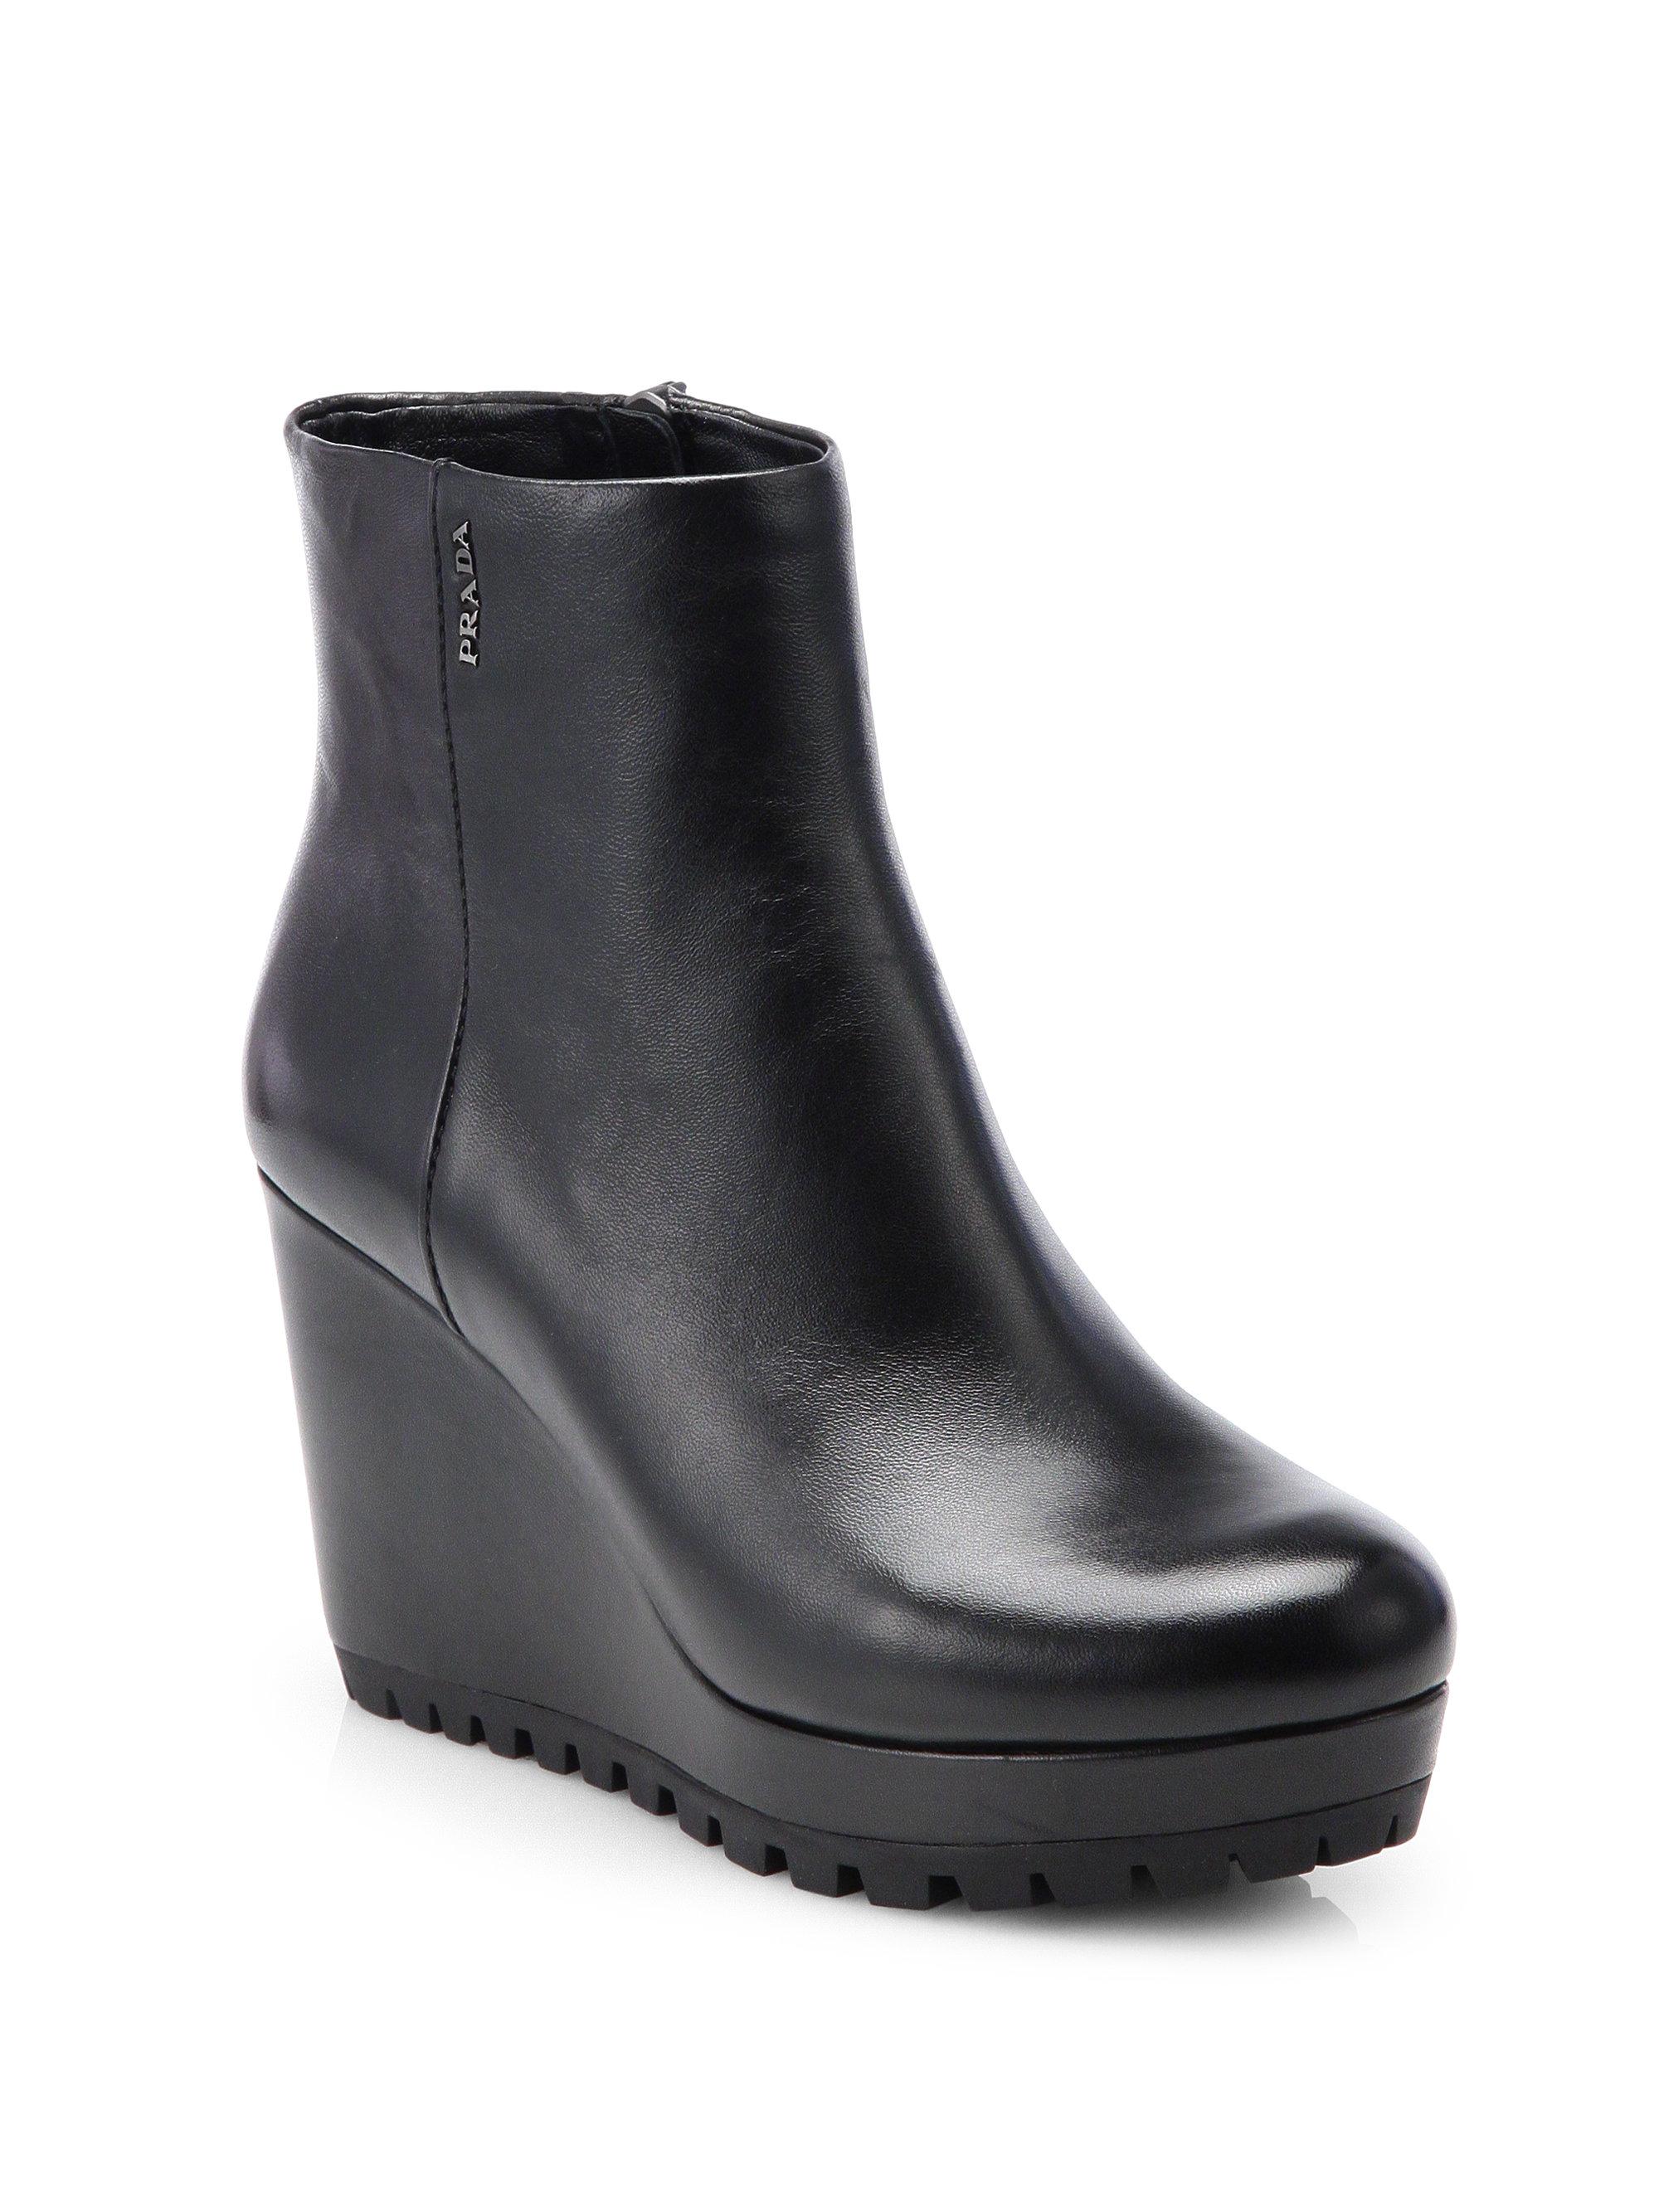 258f134caeda Lyst - Prada Leather Wedge Ankle Boots in Black